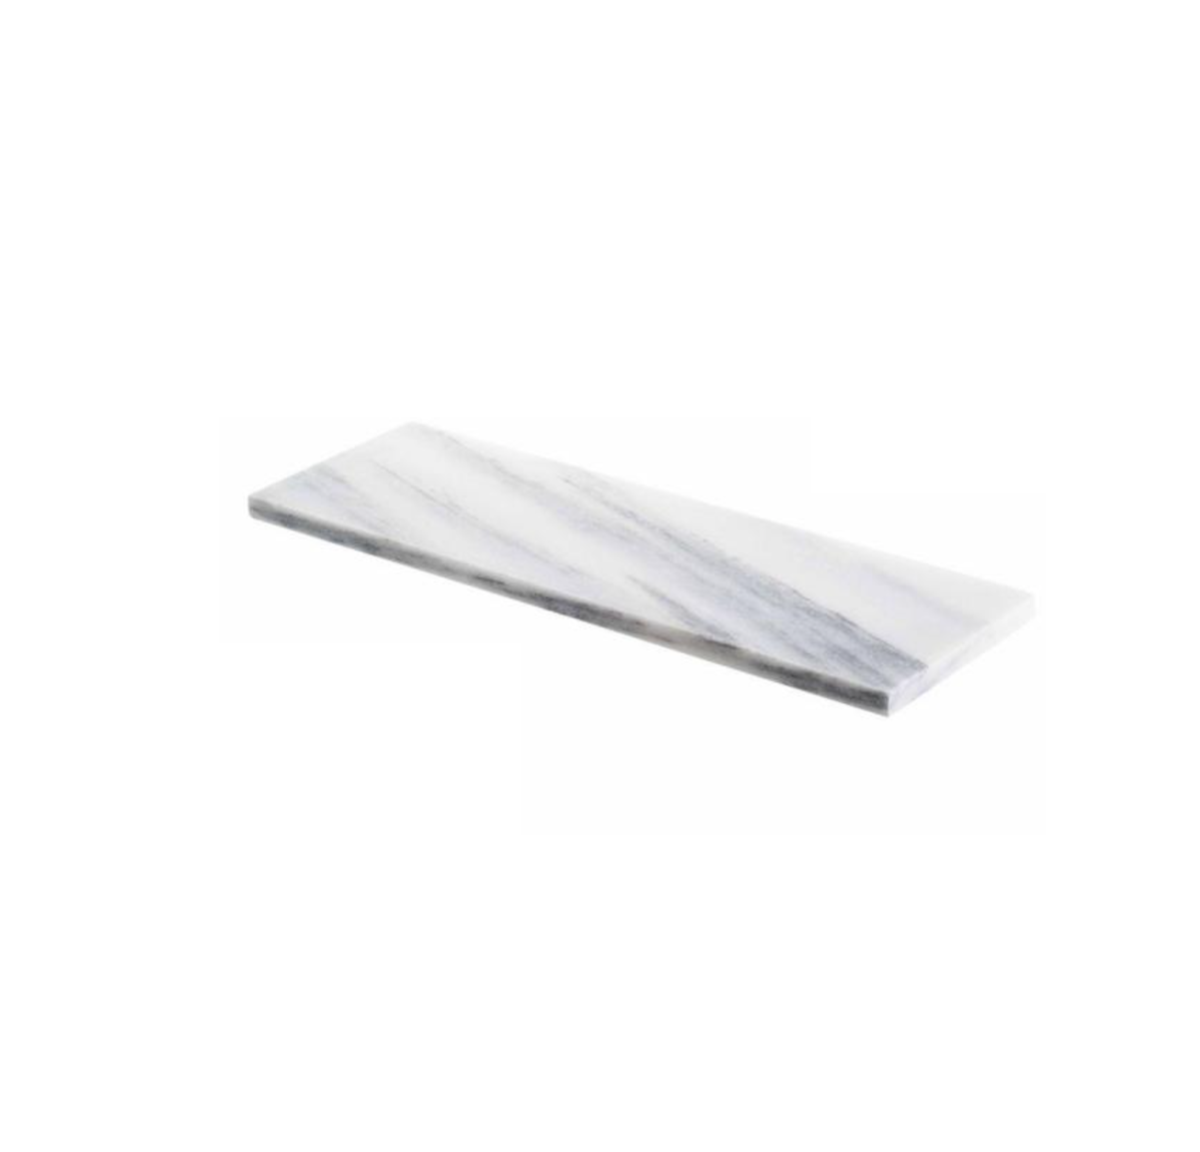 West Hampton Carrara White Marble Matte Honed Tile 4x12 -2